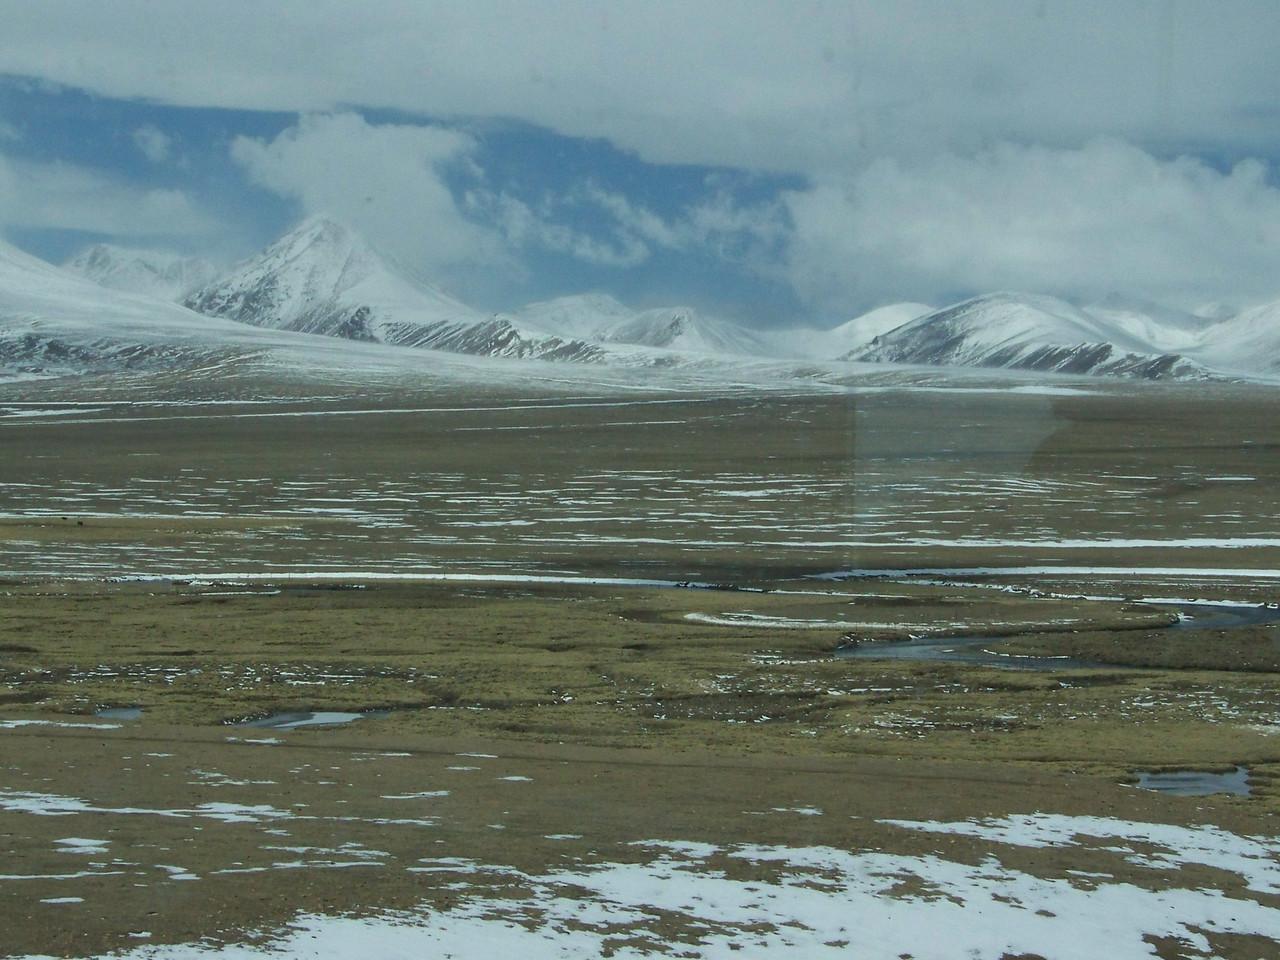 0111 - Scenery on Train Trip Between Beijing and Lhasa.JPG